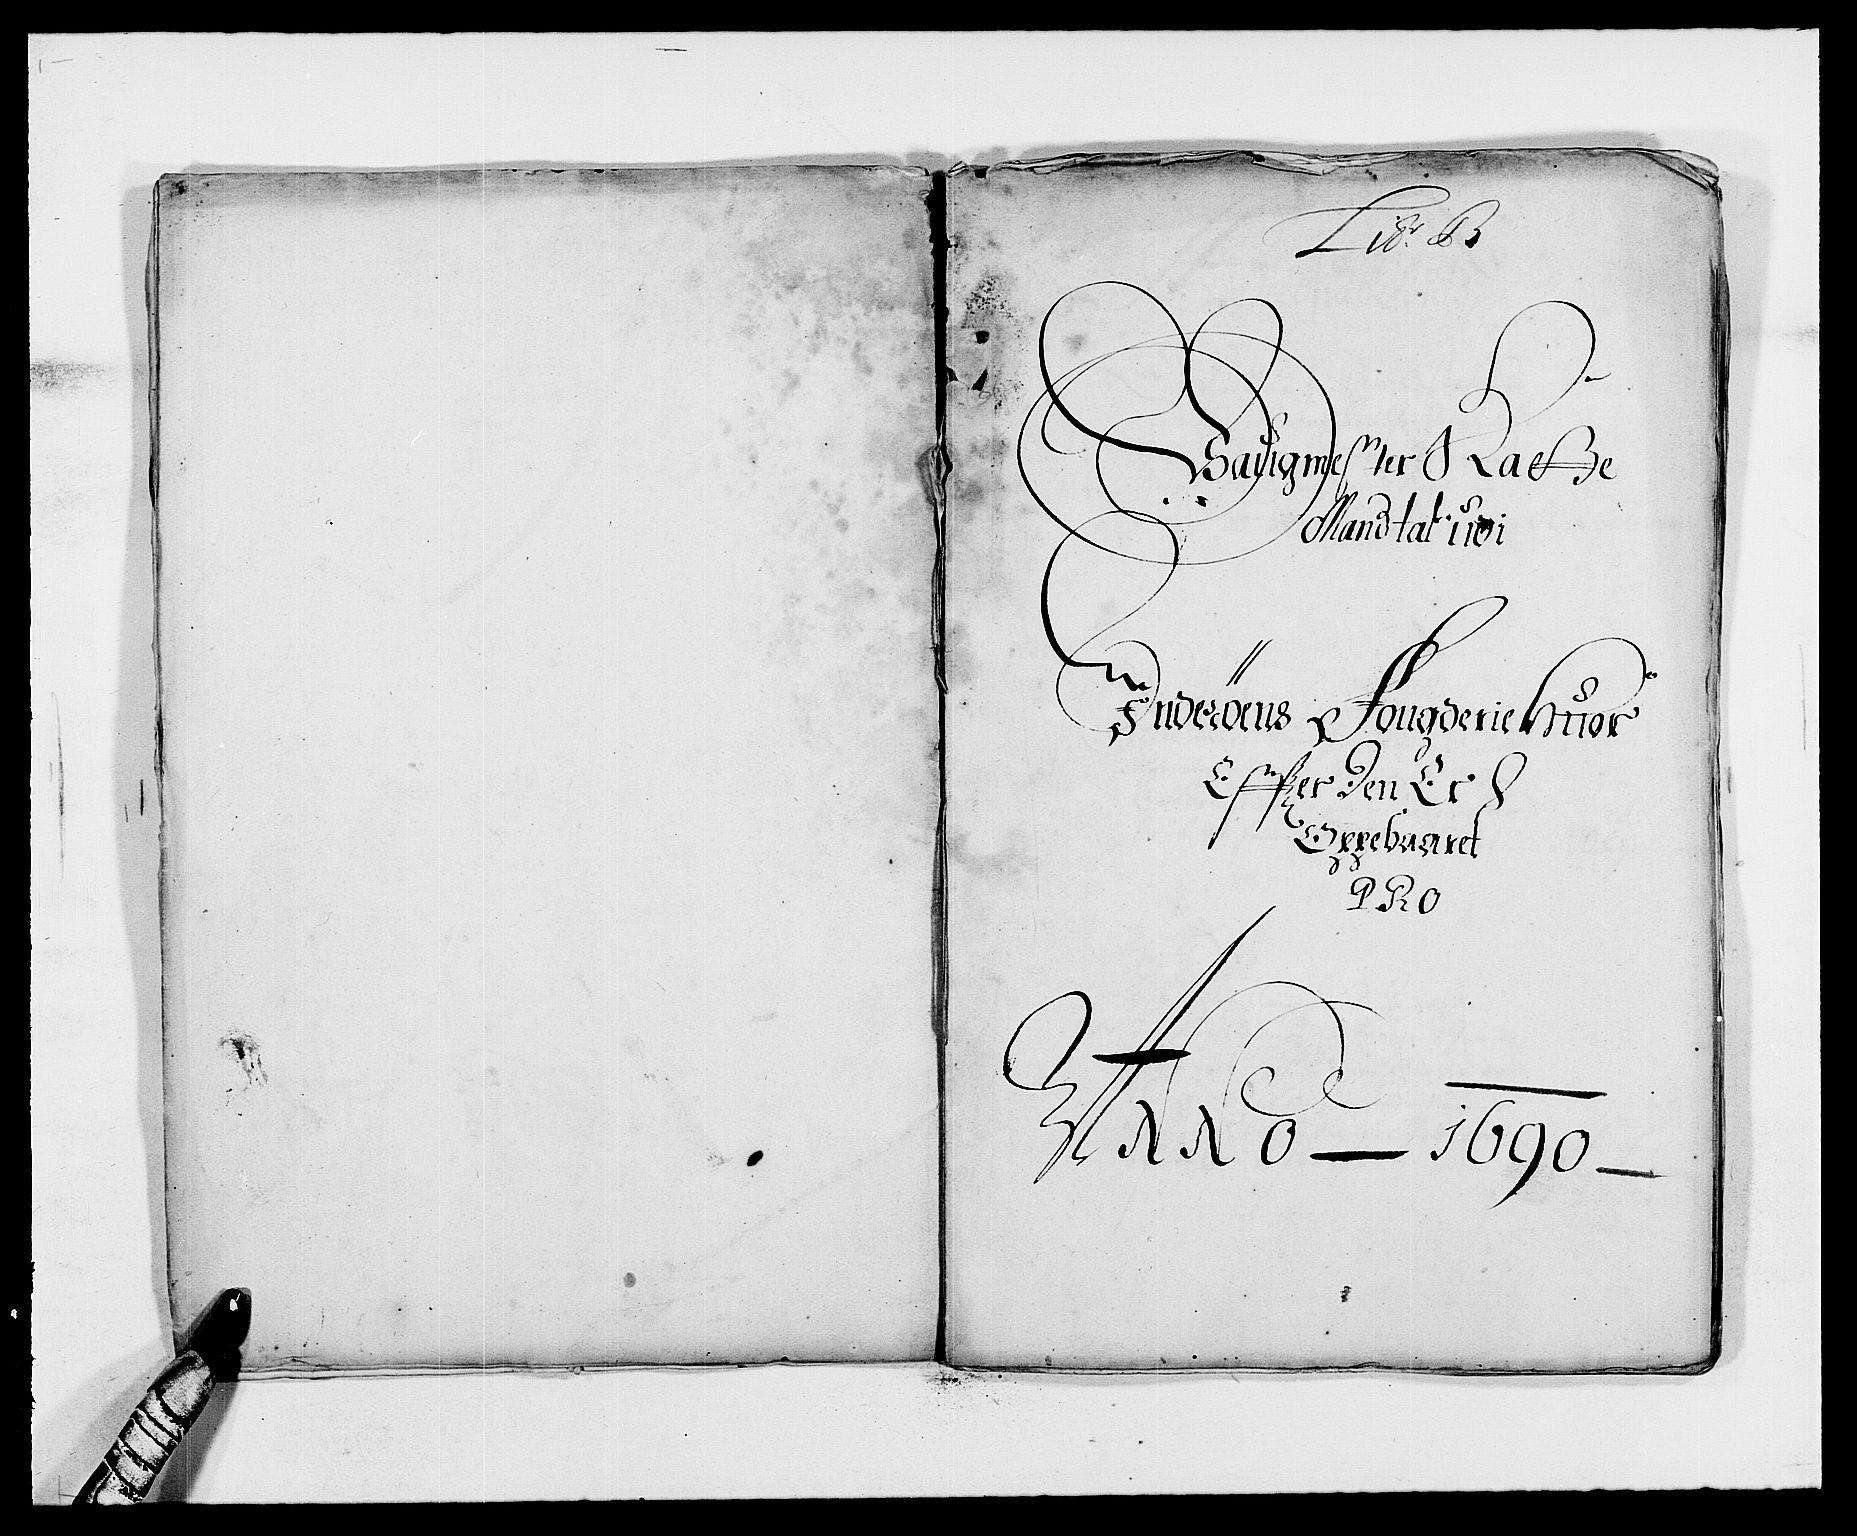 RA, Rentekammeret inntil 1814, Reviderte regnskaper, Fogderegnskap, R63/L4307: Fogderegnskap Inderøy, 1690-1691, s. 70